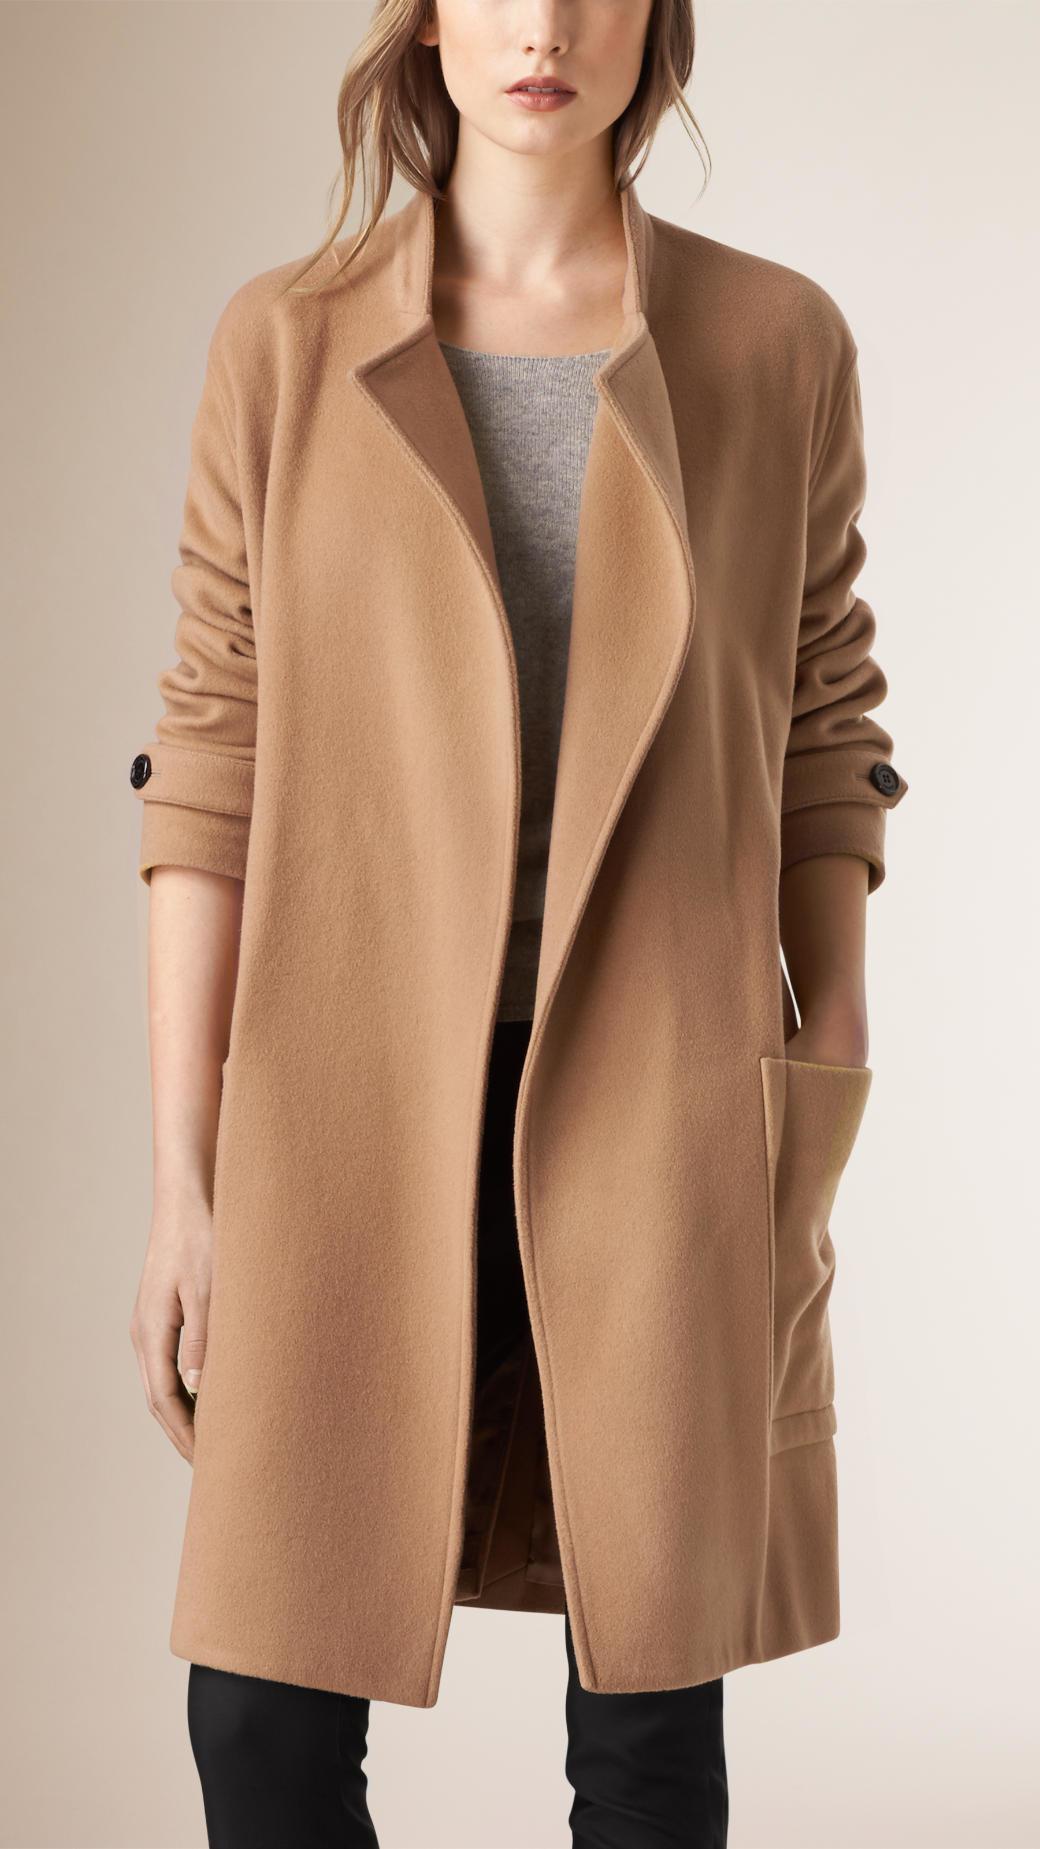 cashmere coat gallery hwmitdk